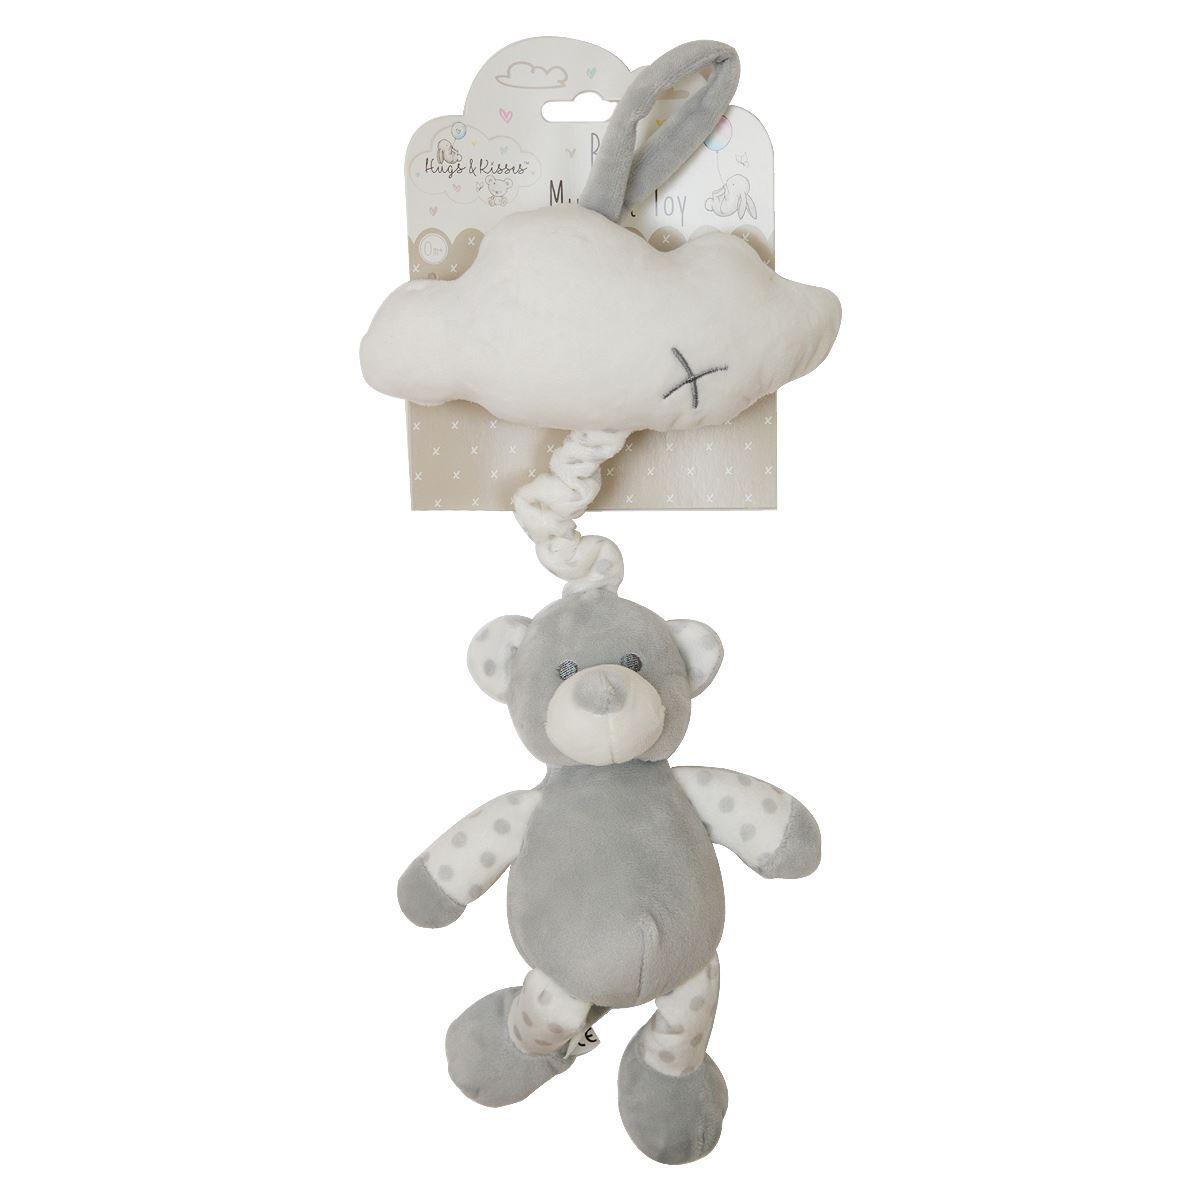 Hugs /& Kisses Baby Spiral Soft Plush Toy Rattle Pink Bunny 29cm Crib Pram Car